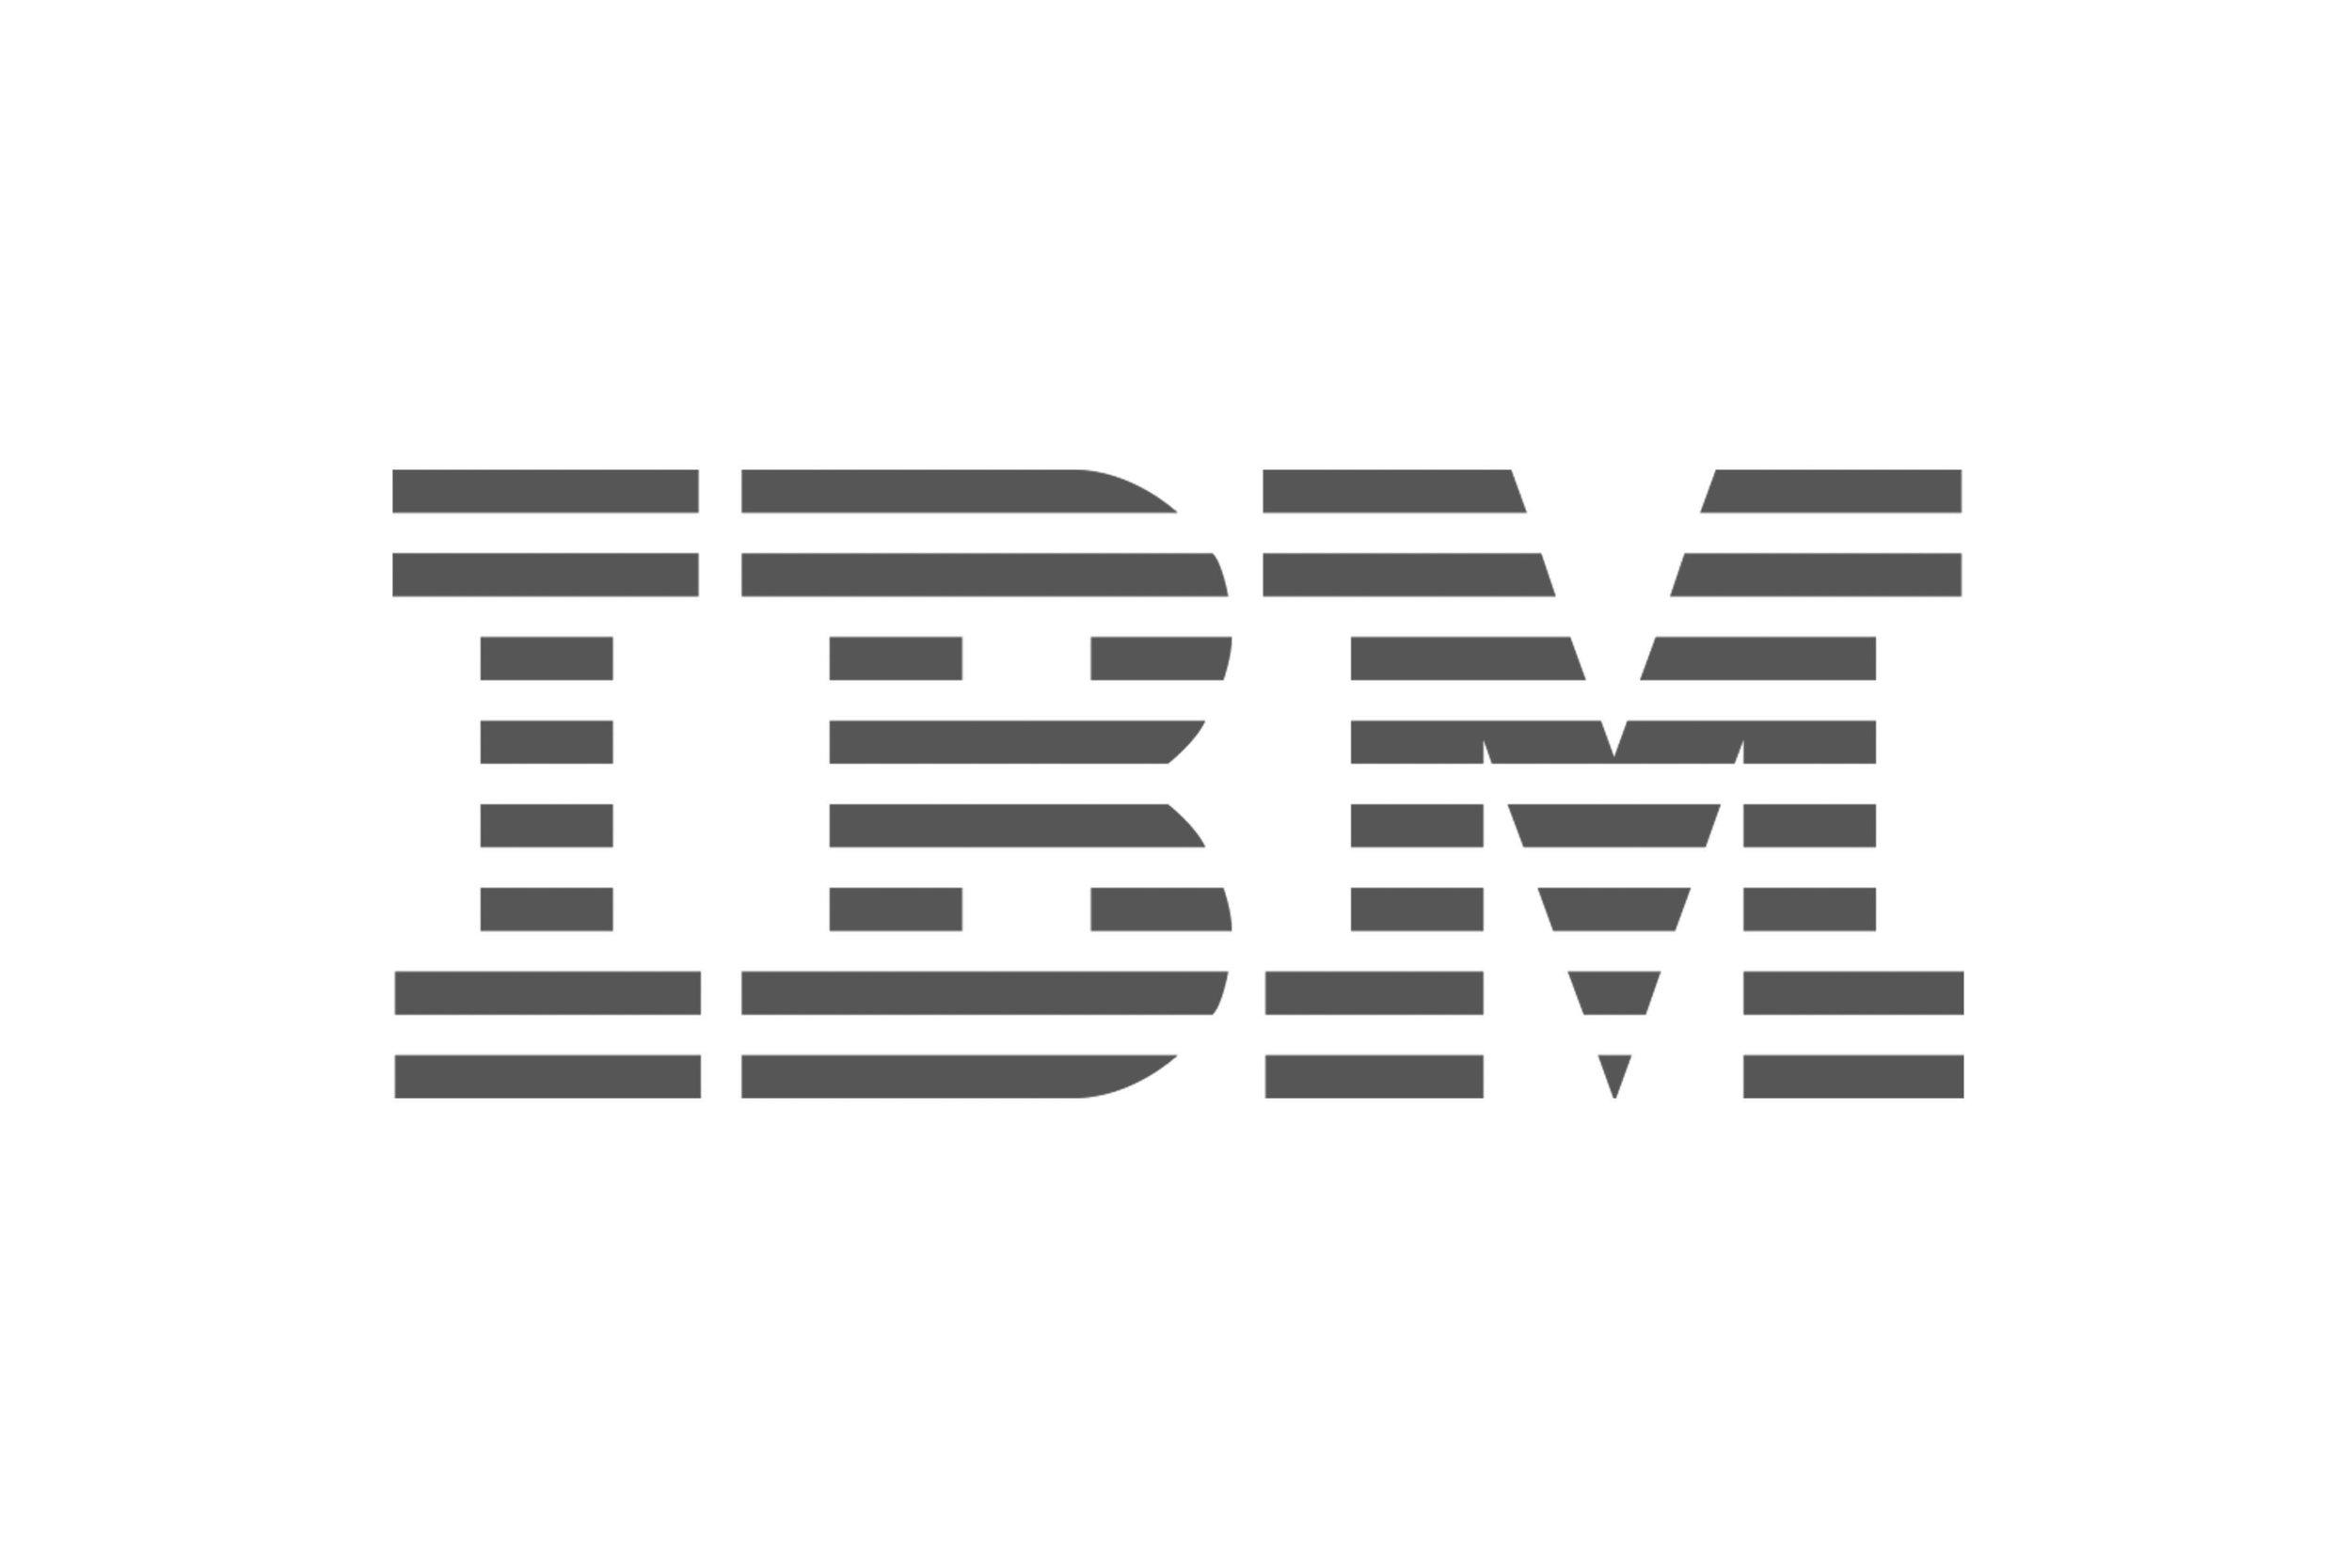 Untitled1_0000s_0039_JEB-ClientLogos_0002s_0007_IBM.png.jpg.jpg